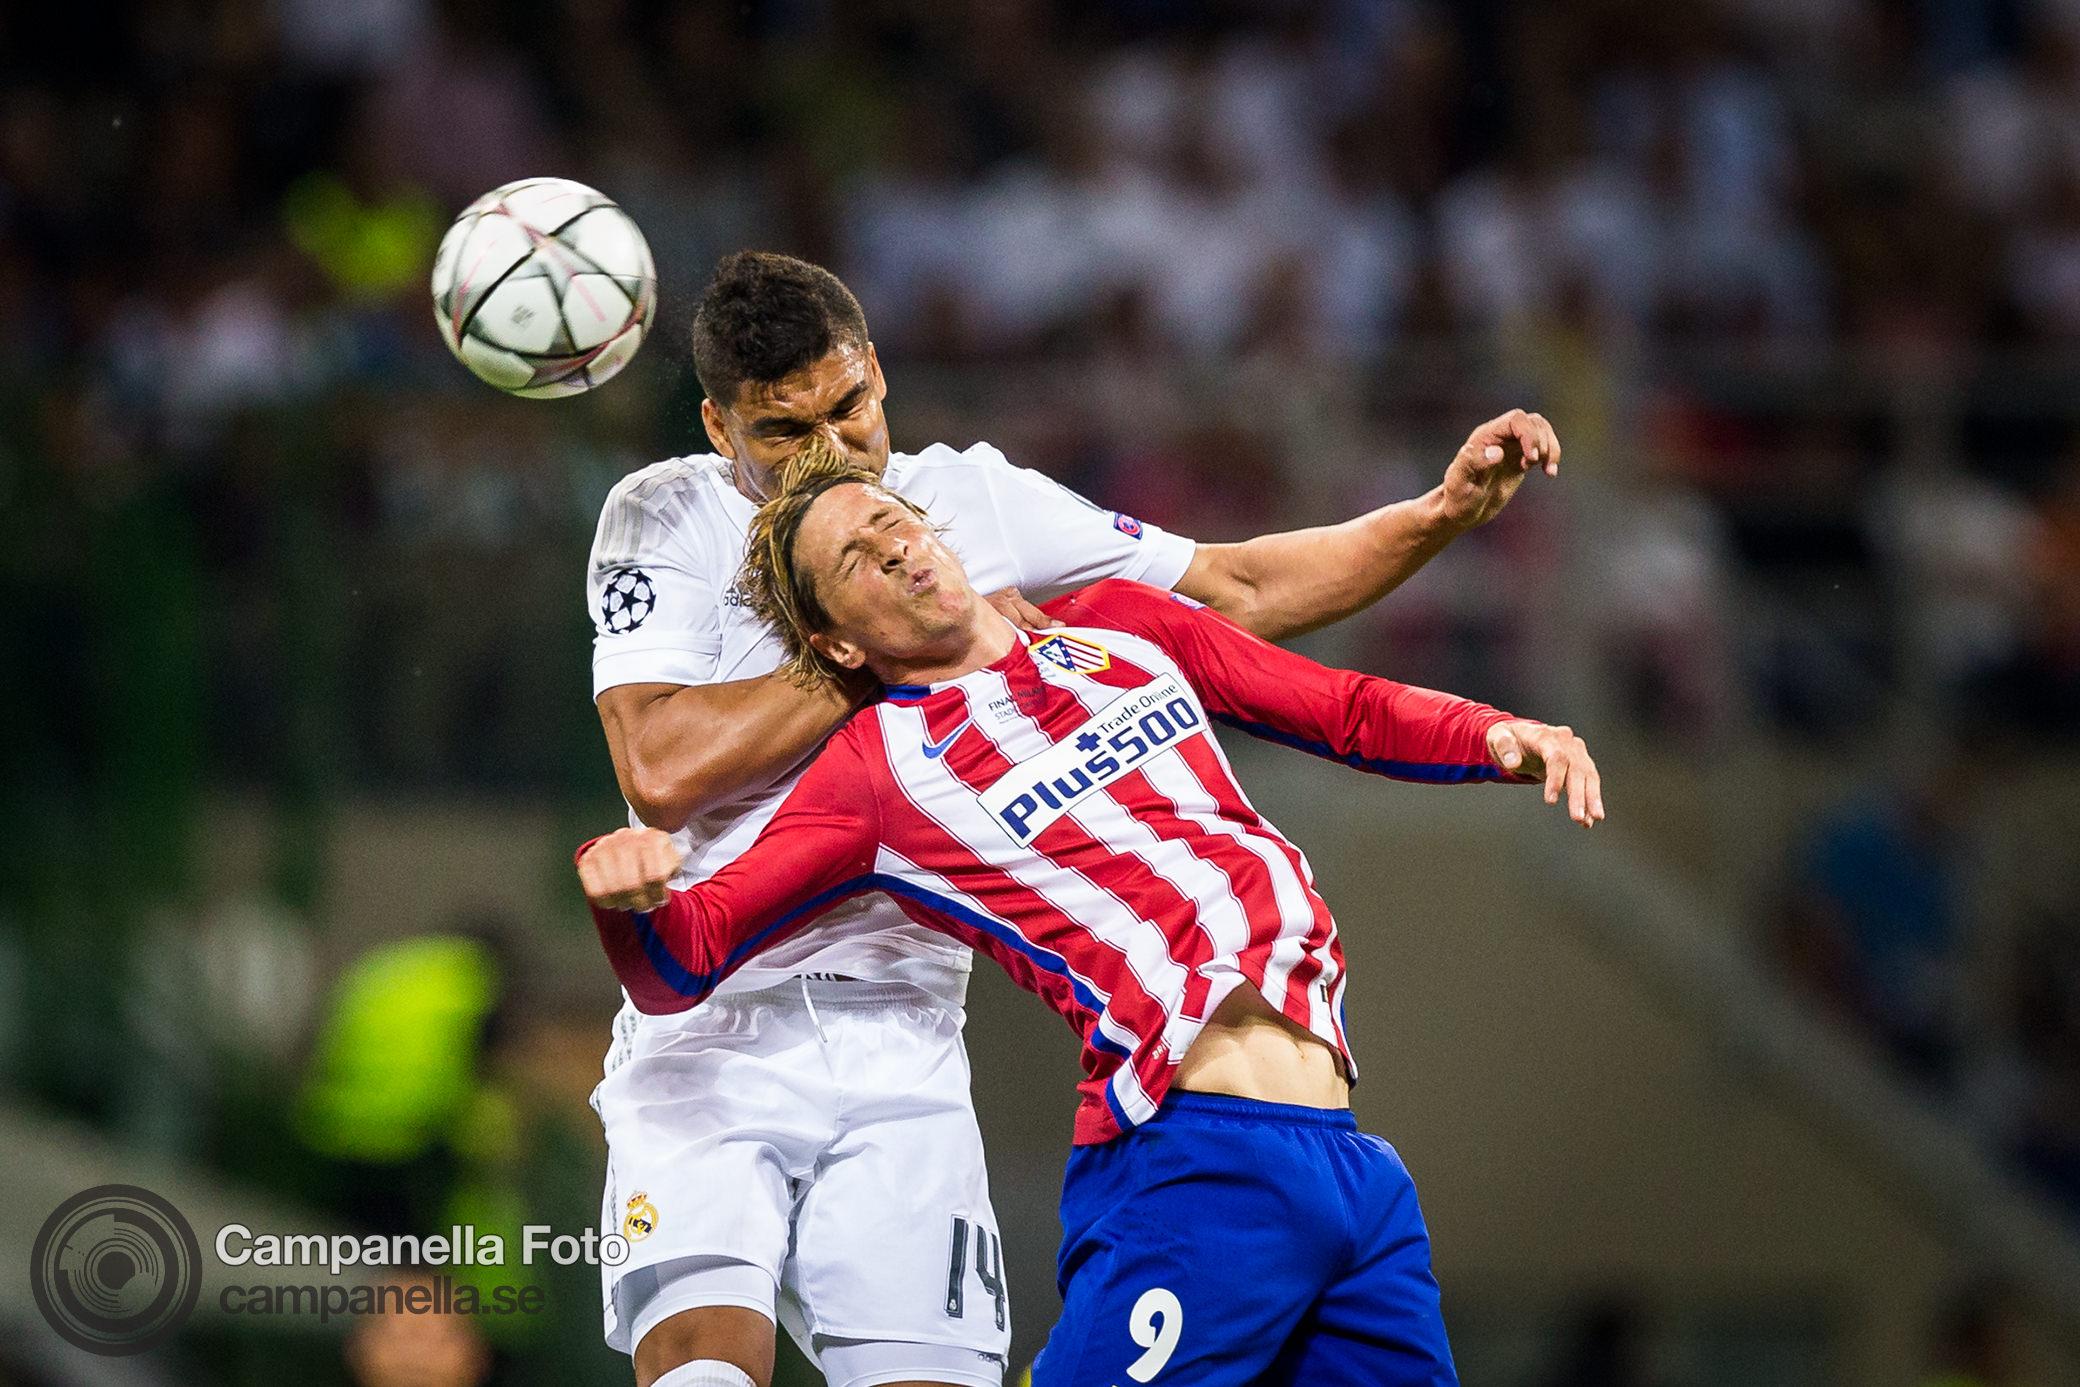 2016 Champions League Final - Michael Campanella Photography